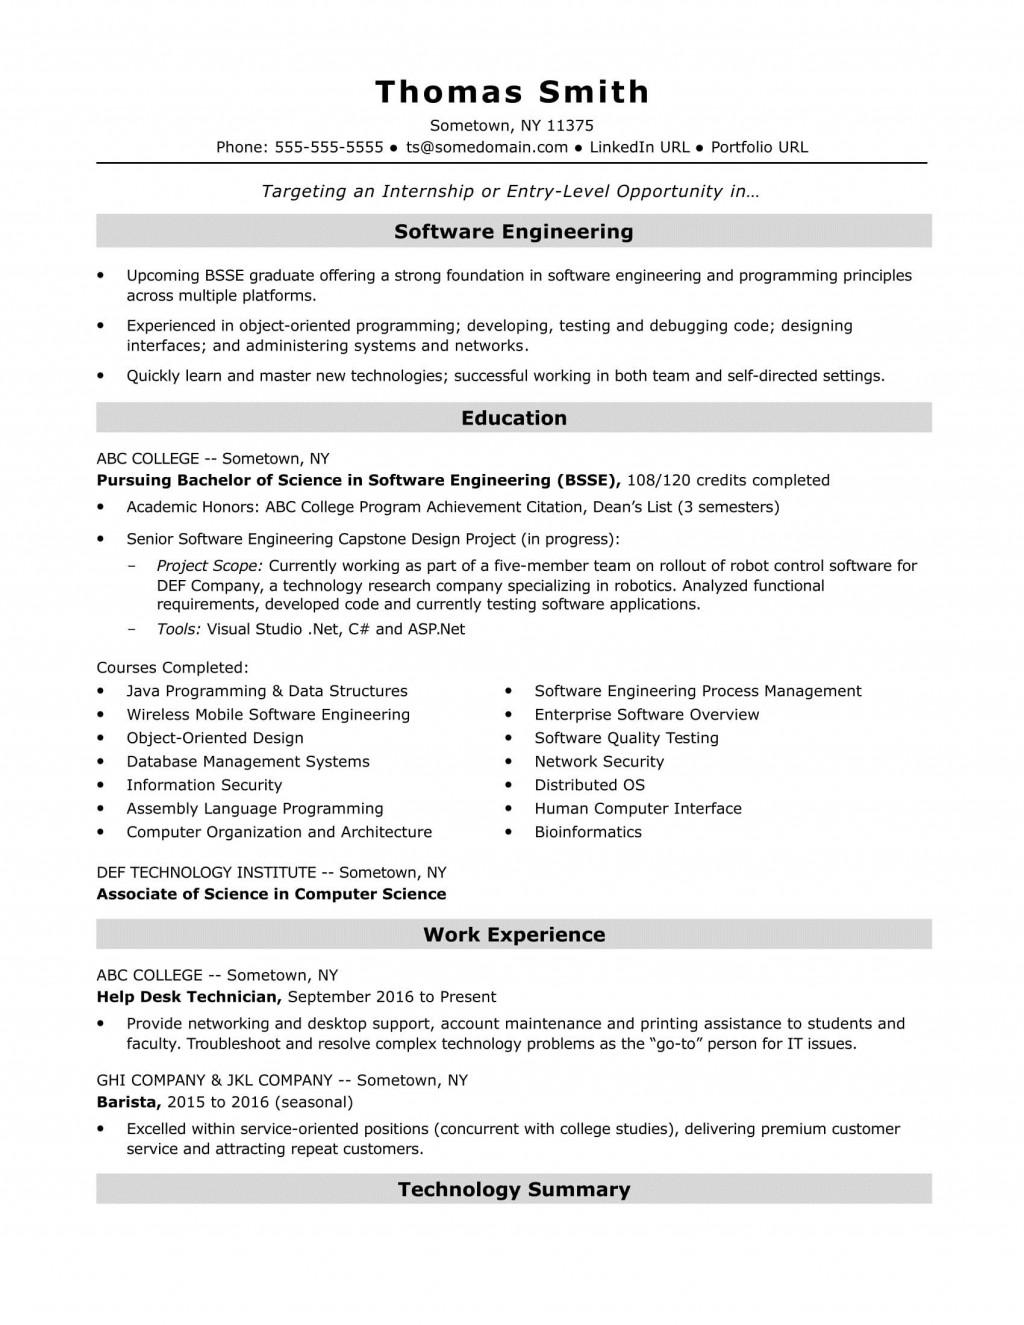 006 Impressive Software Engineer Resume Template High Def  Word Format Free Download MicrosoftLarge